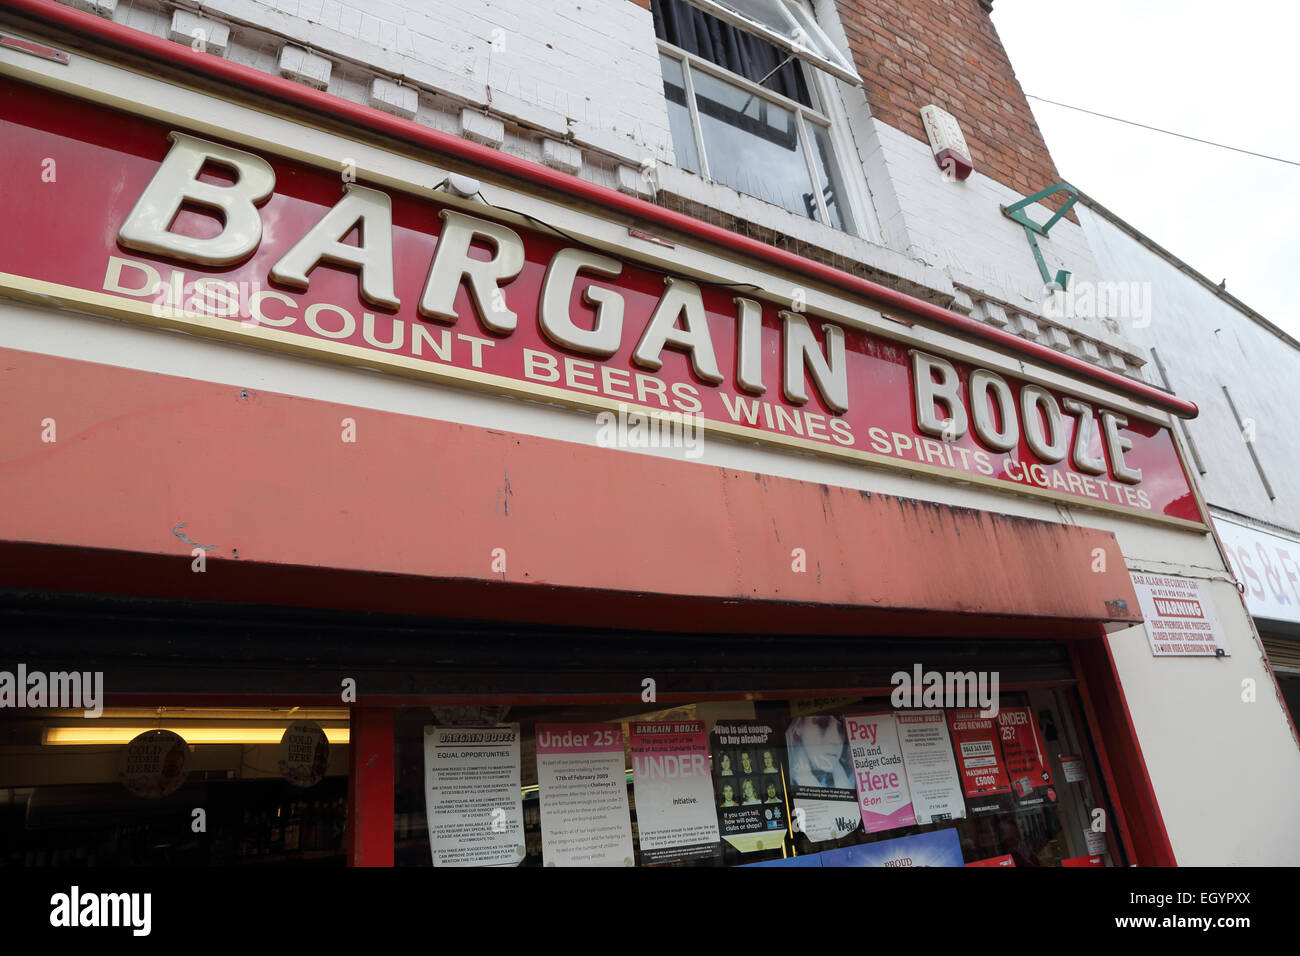 Bargain Booze shop front - Stock Image